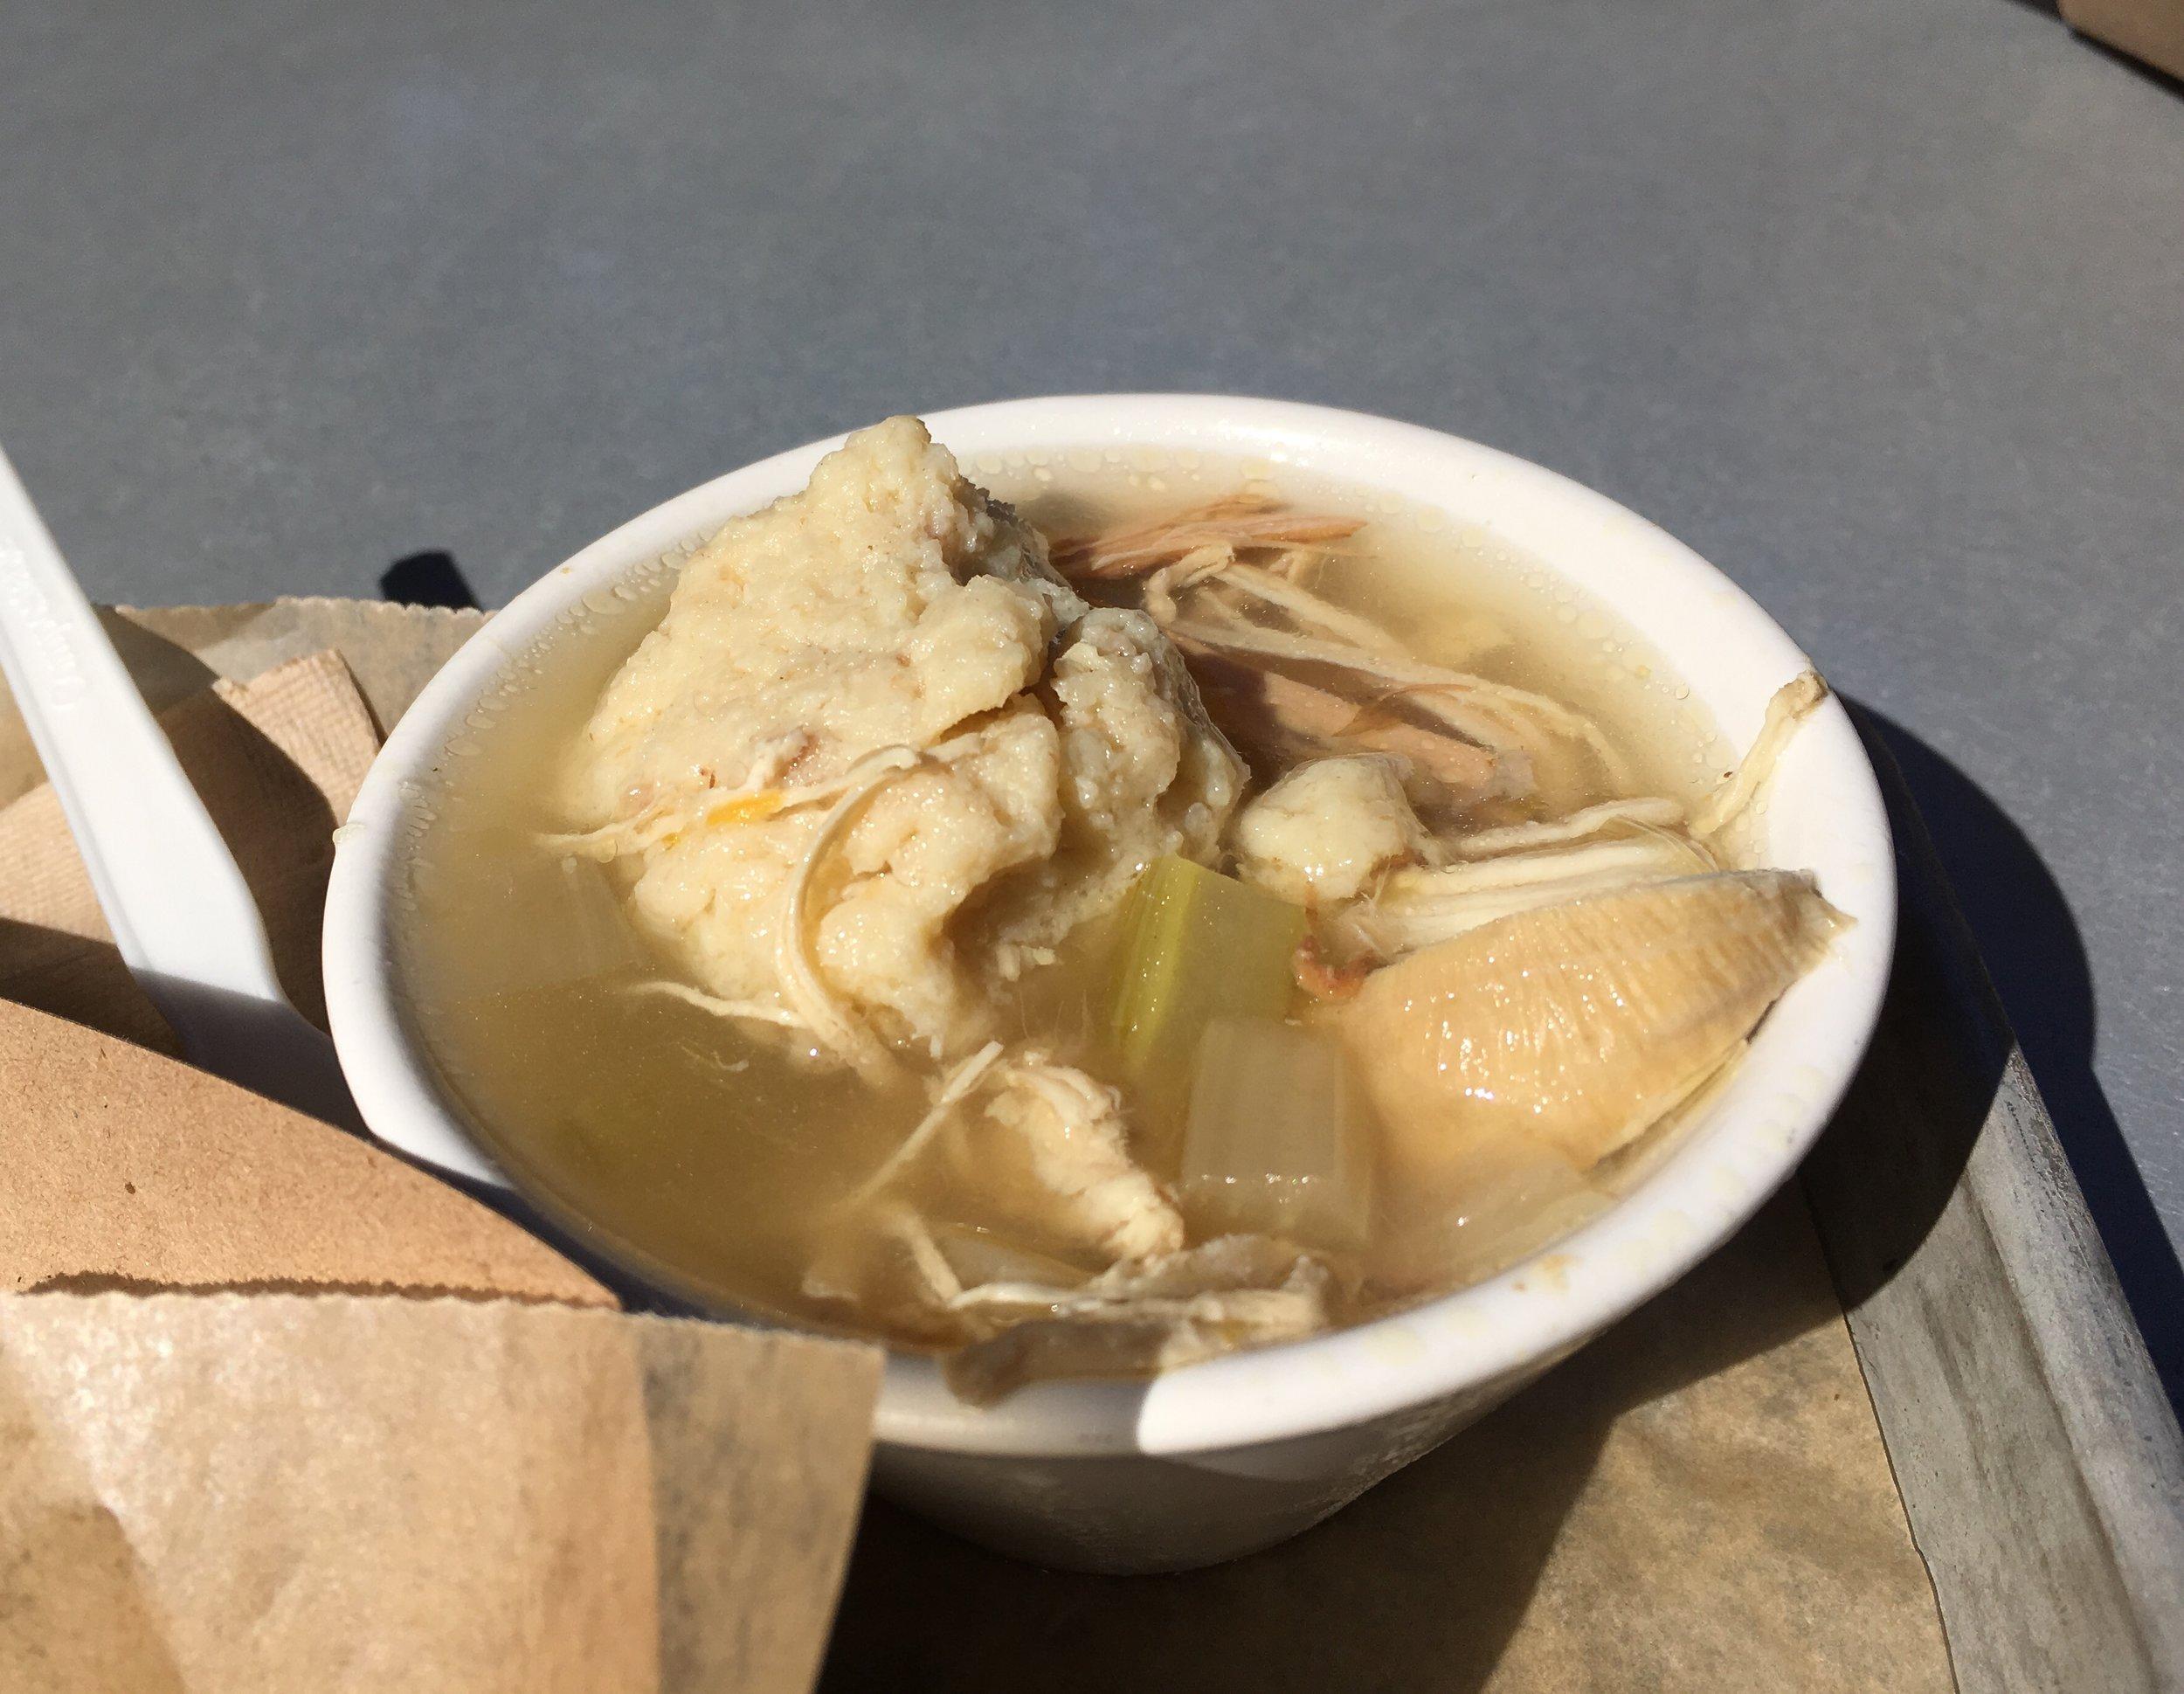 Alotta Ball (matzoh) in a little bowl